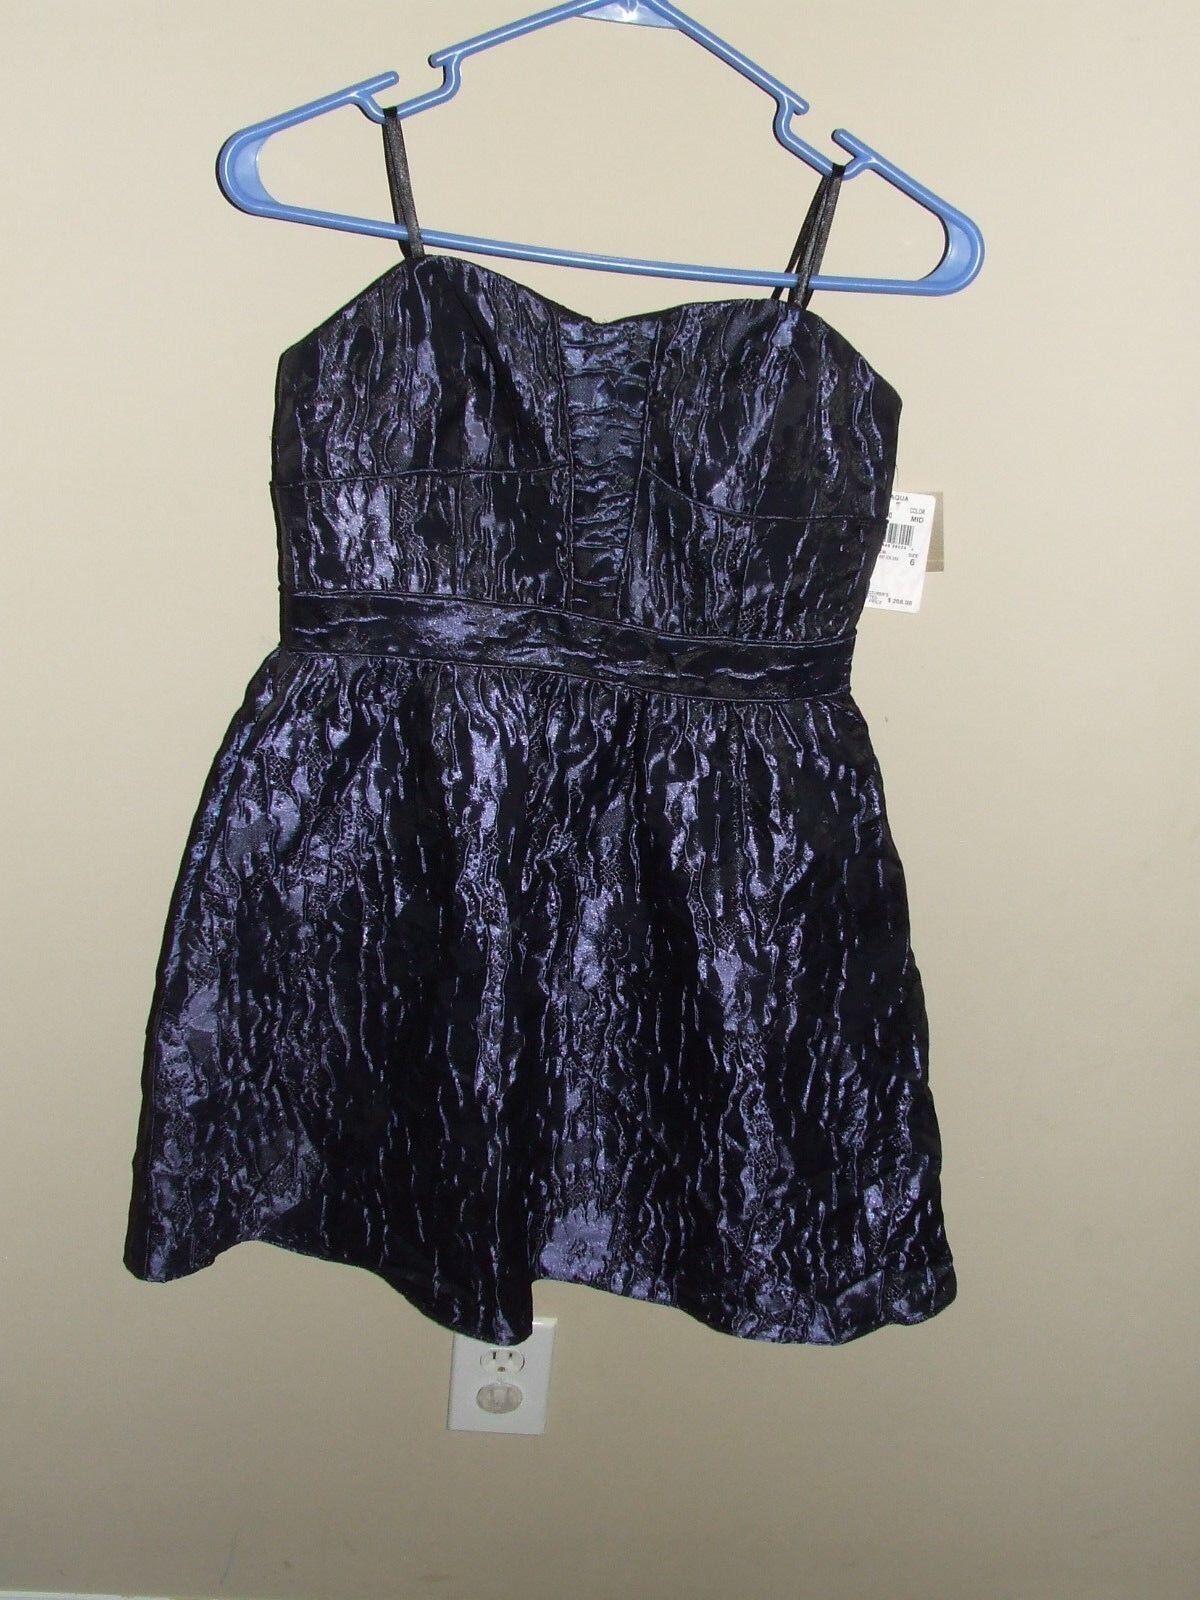 NWT Sz 6  Aidan Mattox Strapless Dress Navy Blau schwarz Fit N Flare Cocktail Form